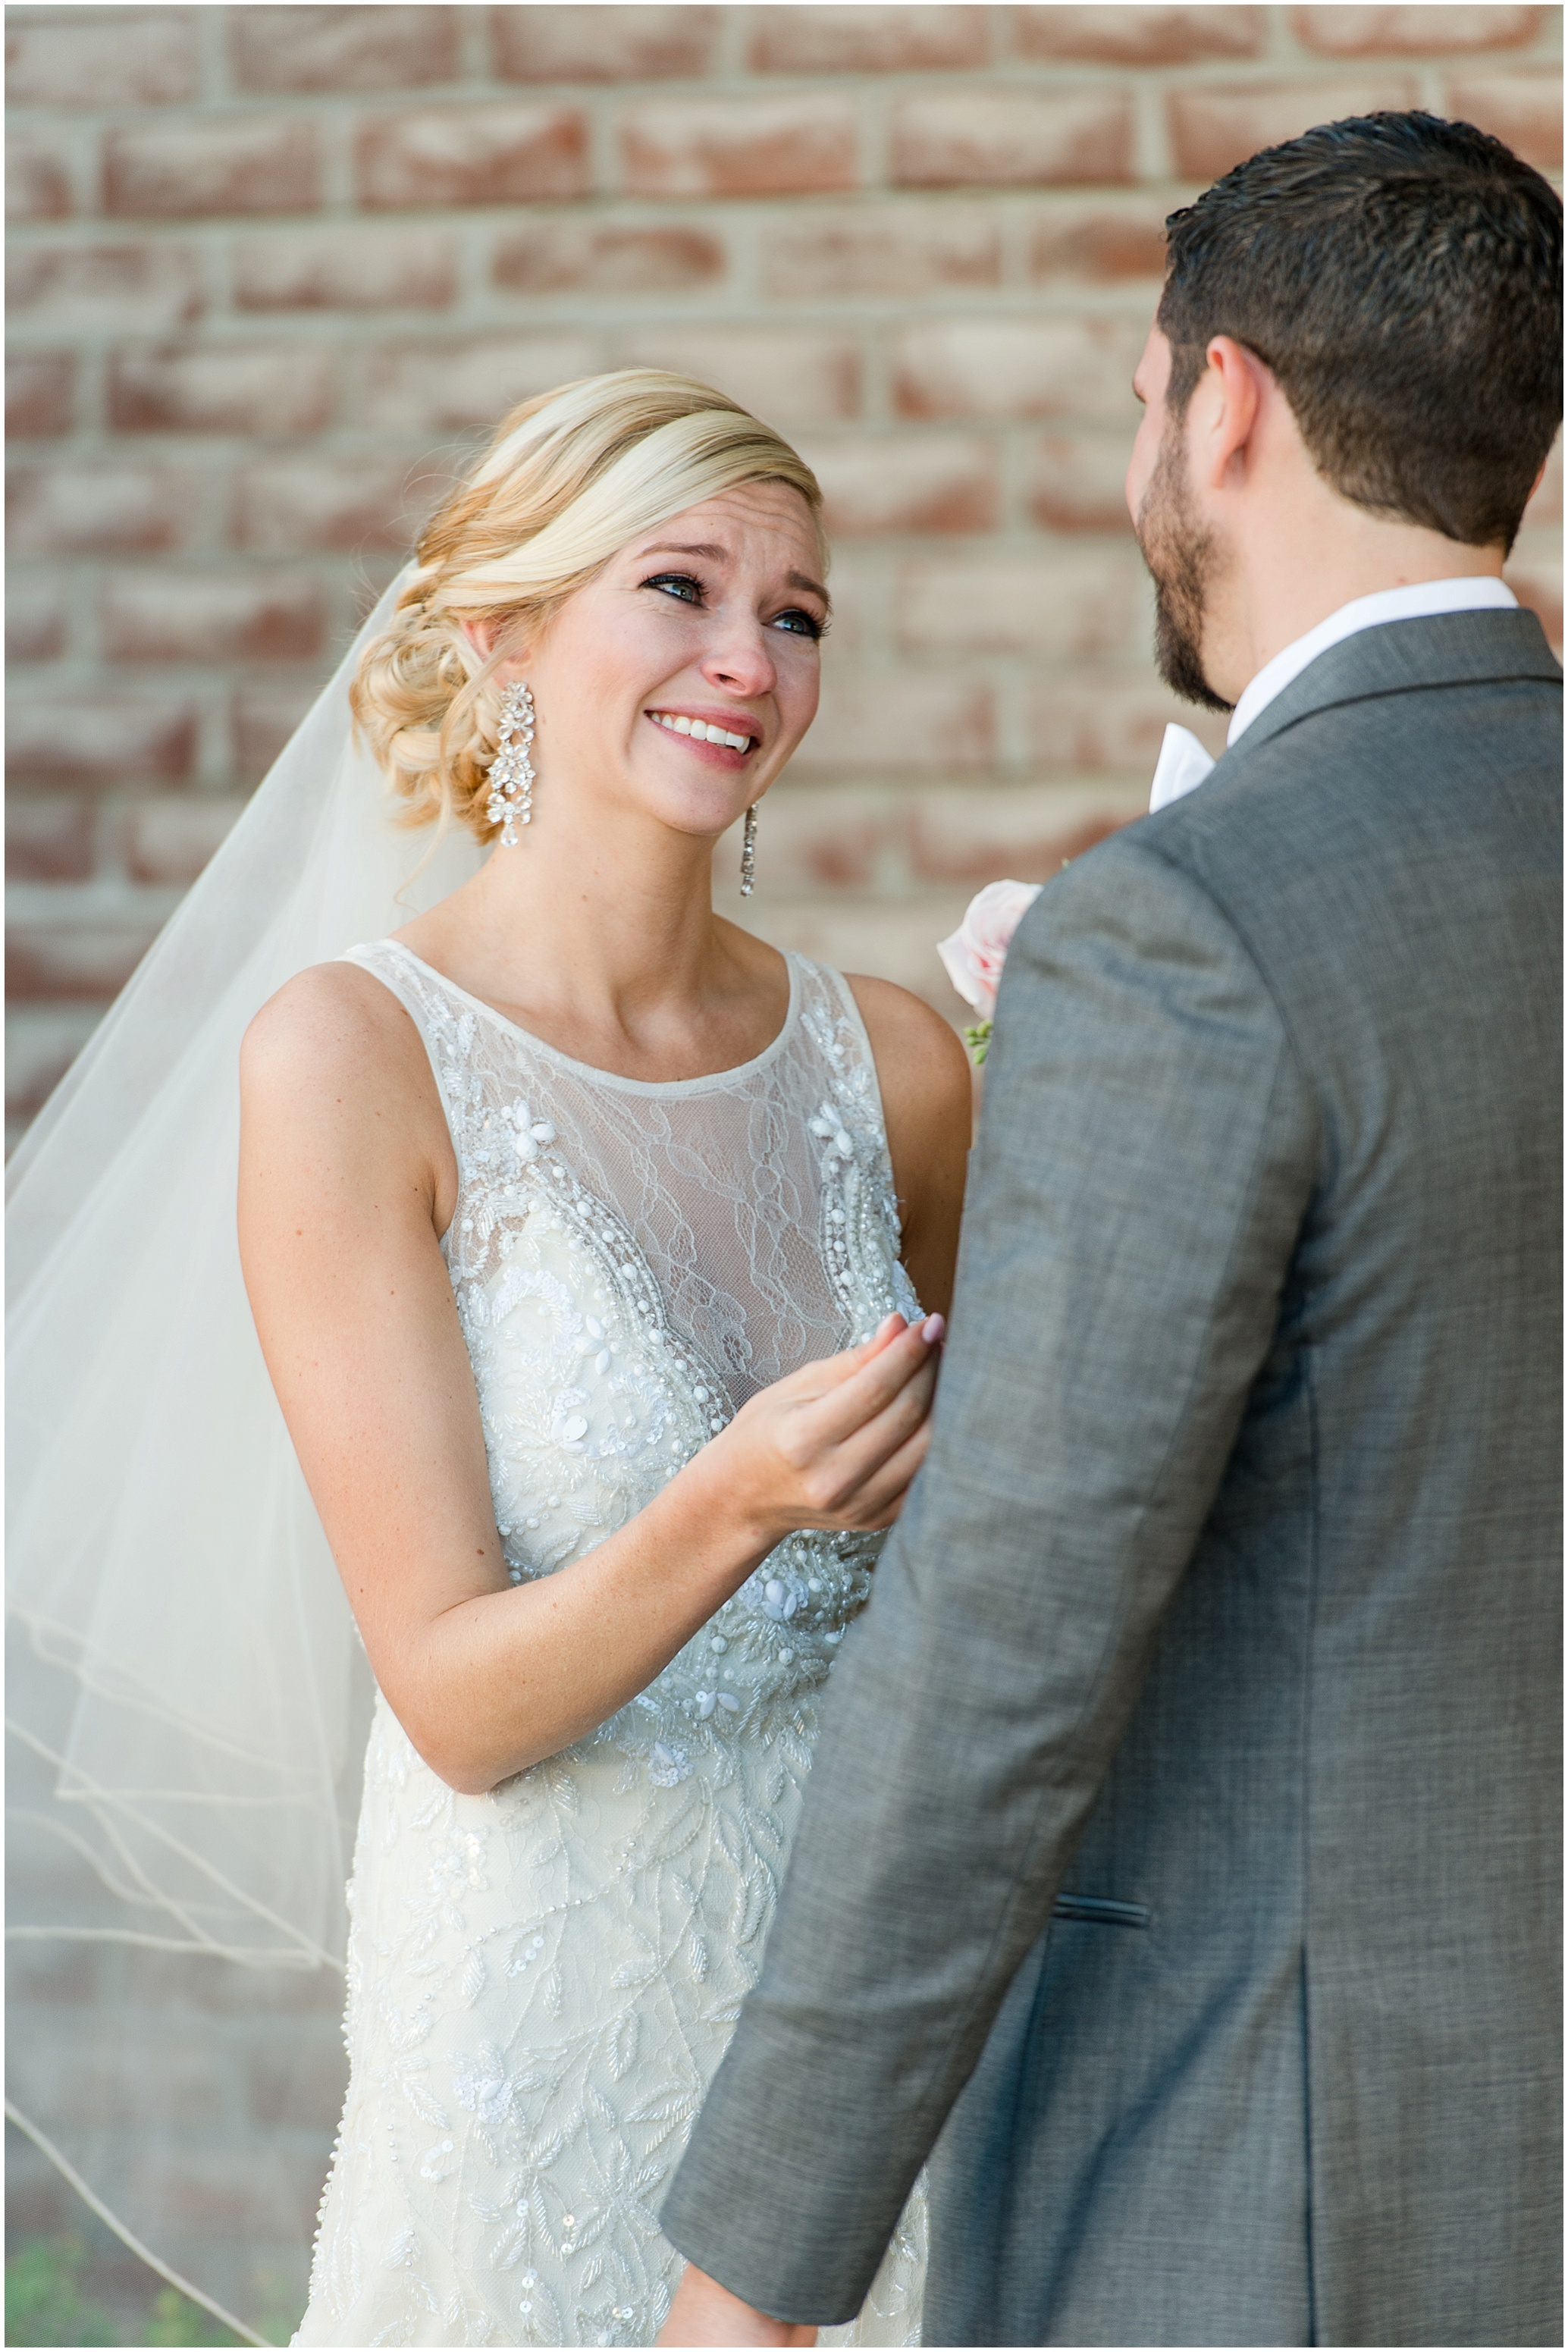 Hannah Leigh Photography Tabrizis Baltimore Wedding_2213.jpg